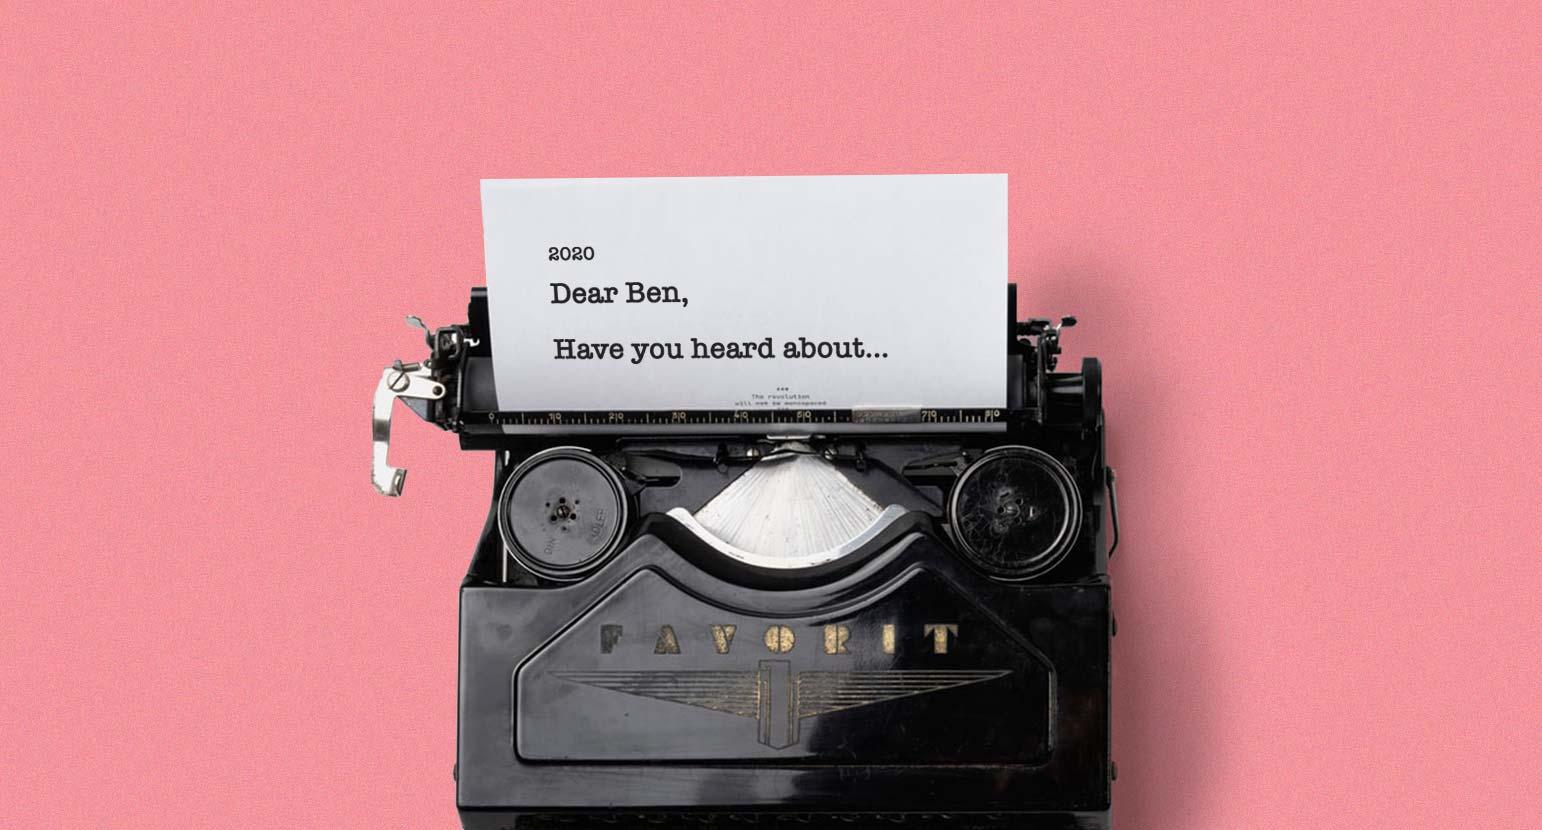 Personalisation marketing trend typewriter